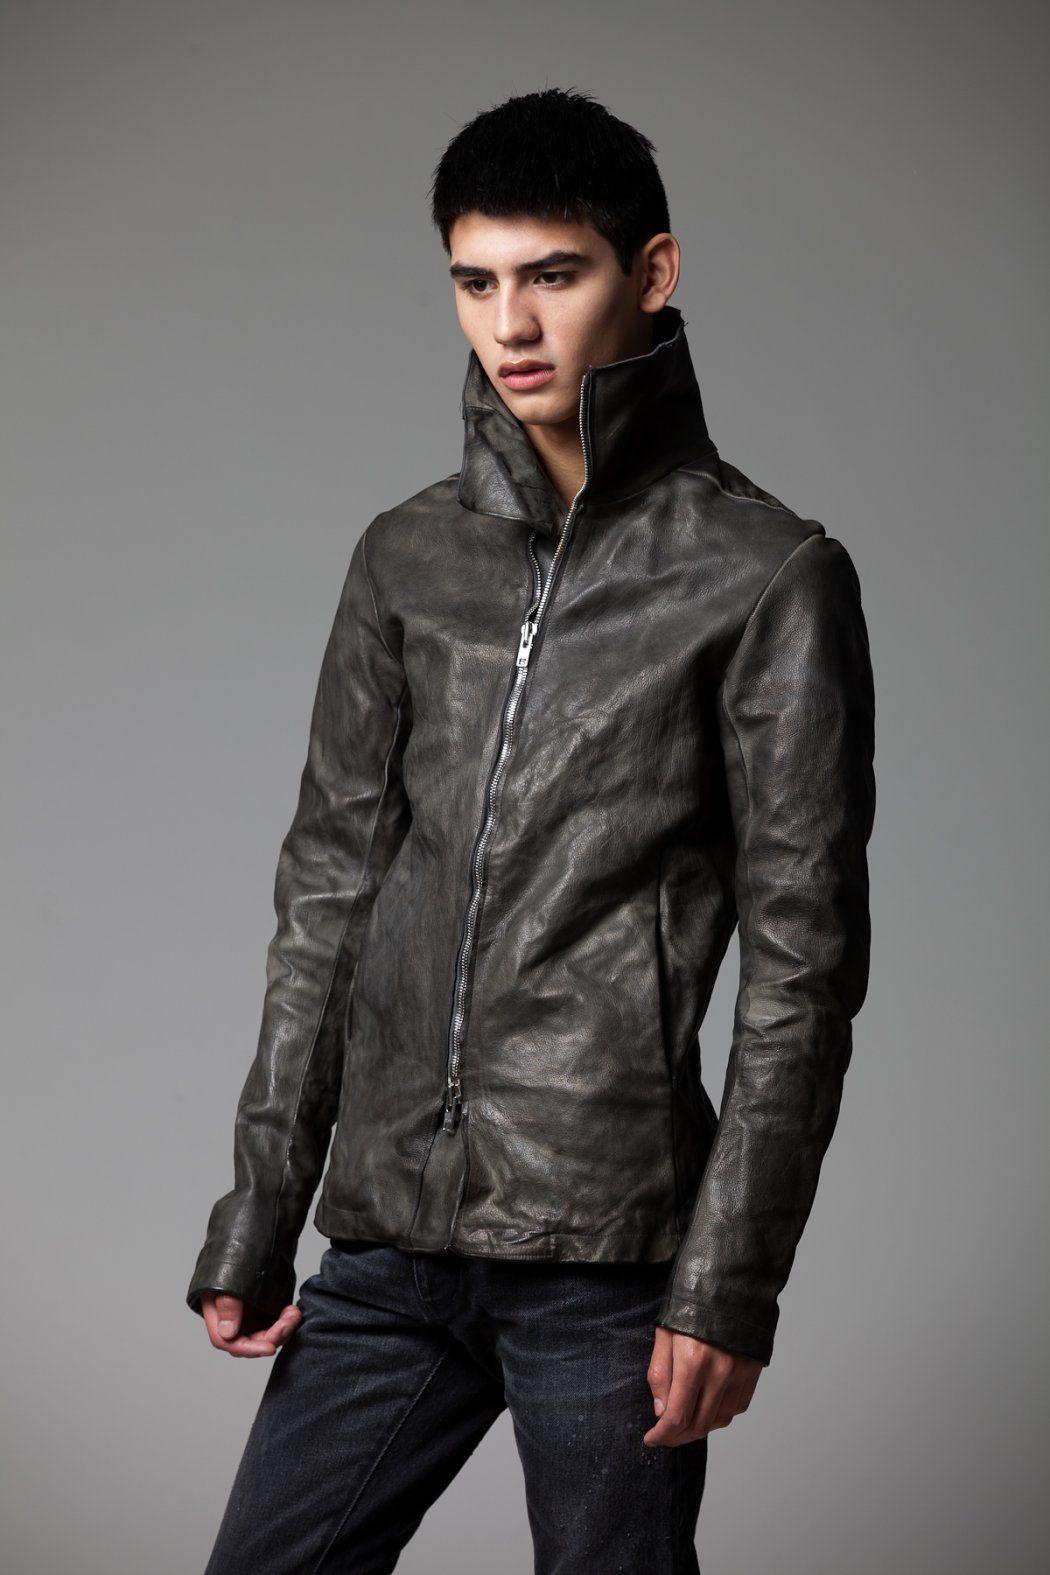 Men's jacket collar - Men S Designer Jackets San Francisco Archivesf Com The Archive